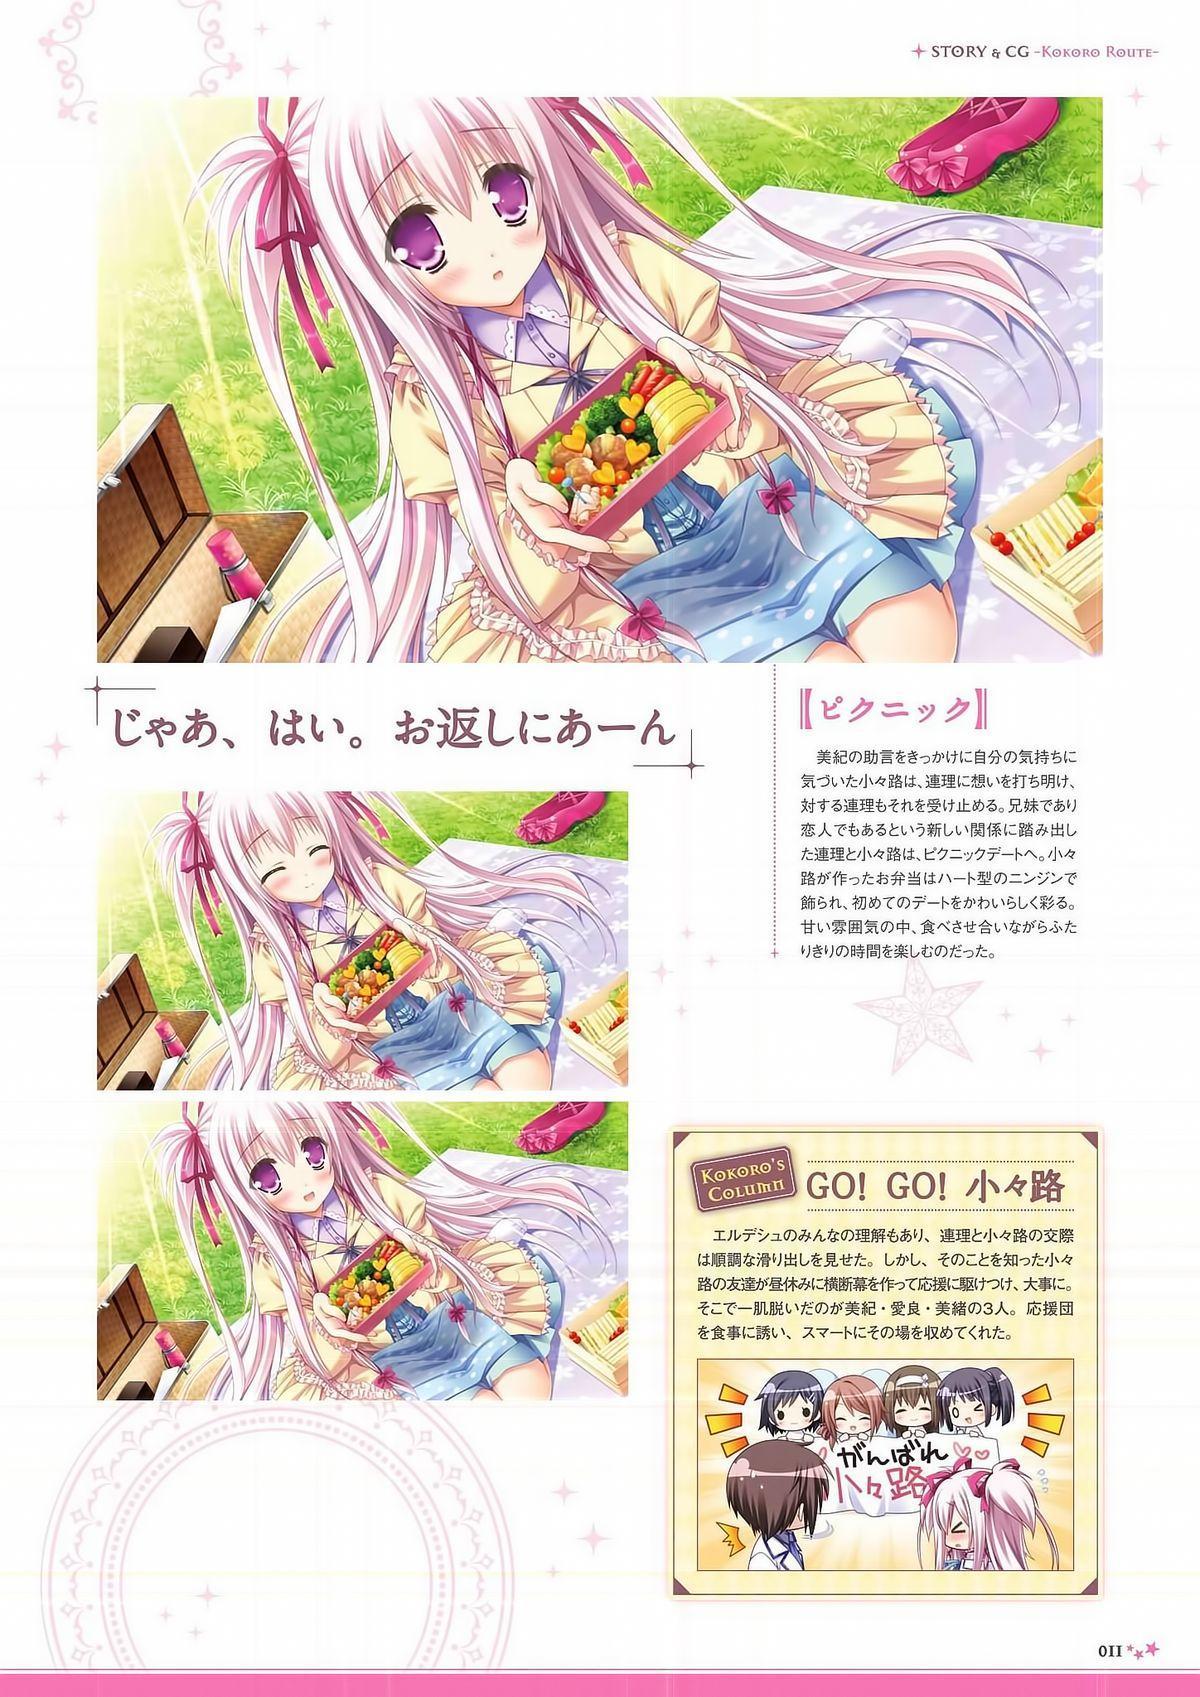 Sekai to Sekai no Mannaka de Visual Fanbook 12